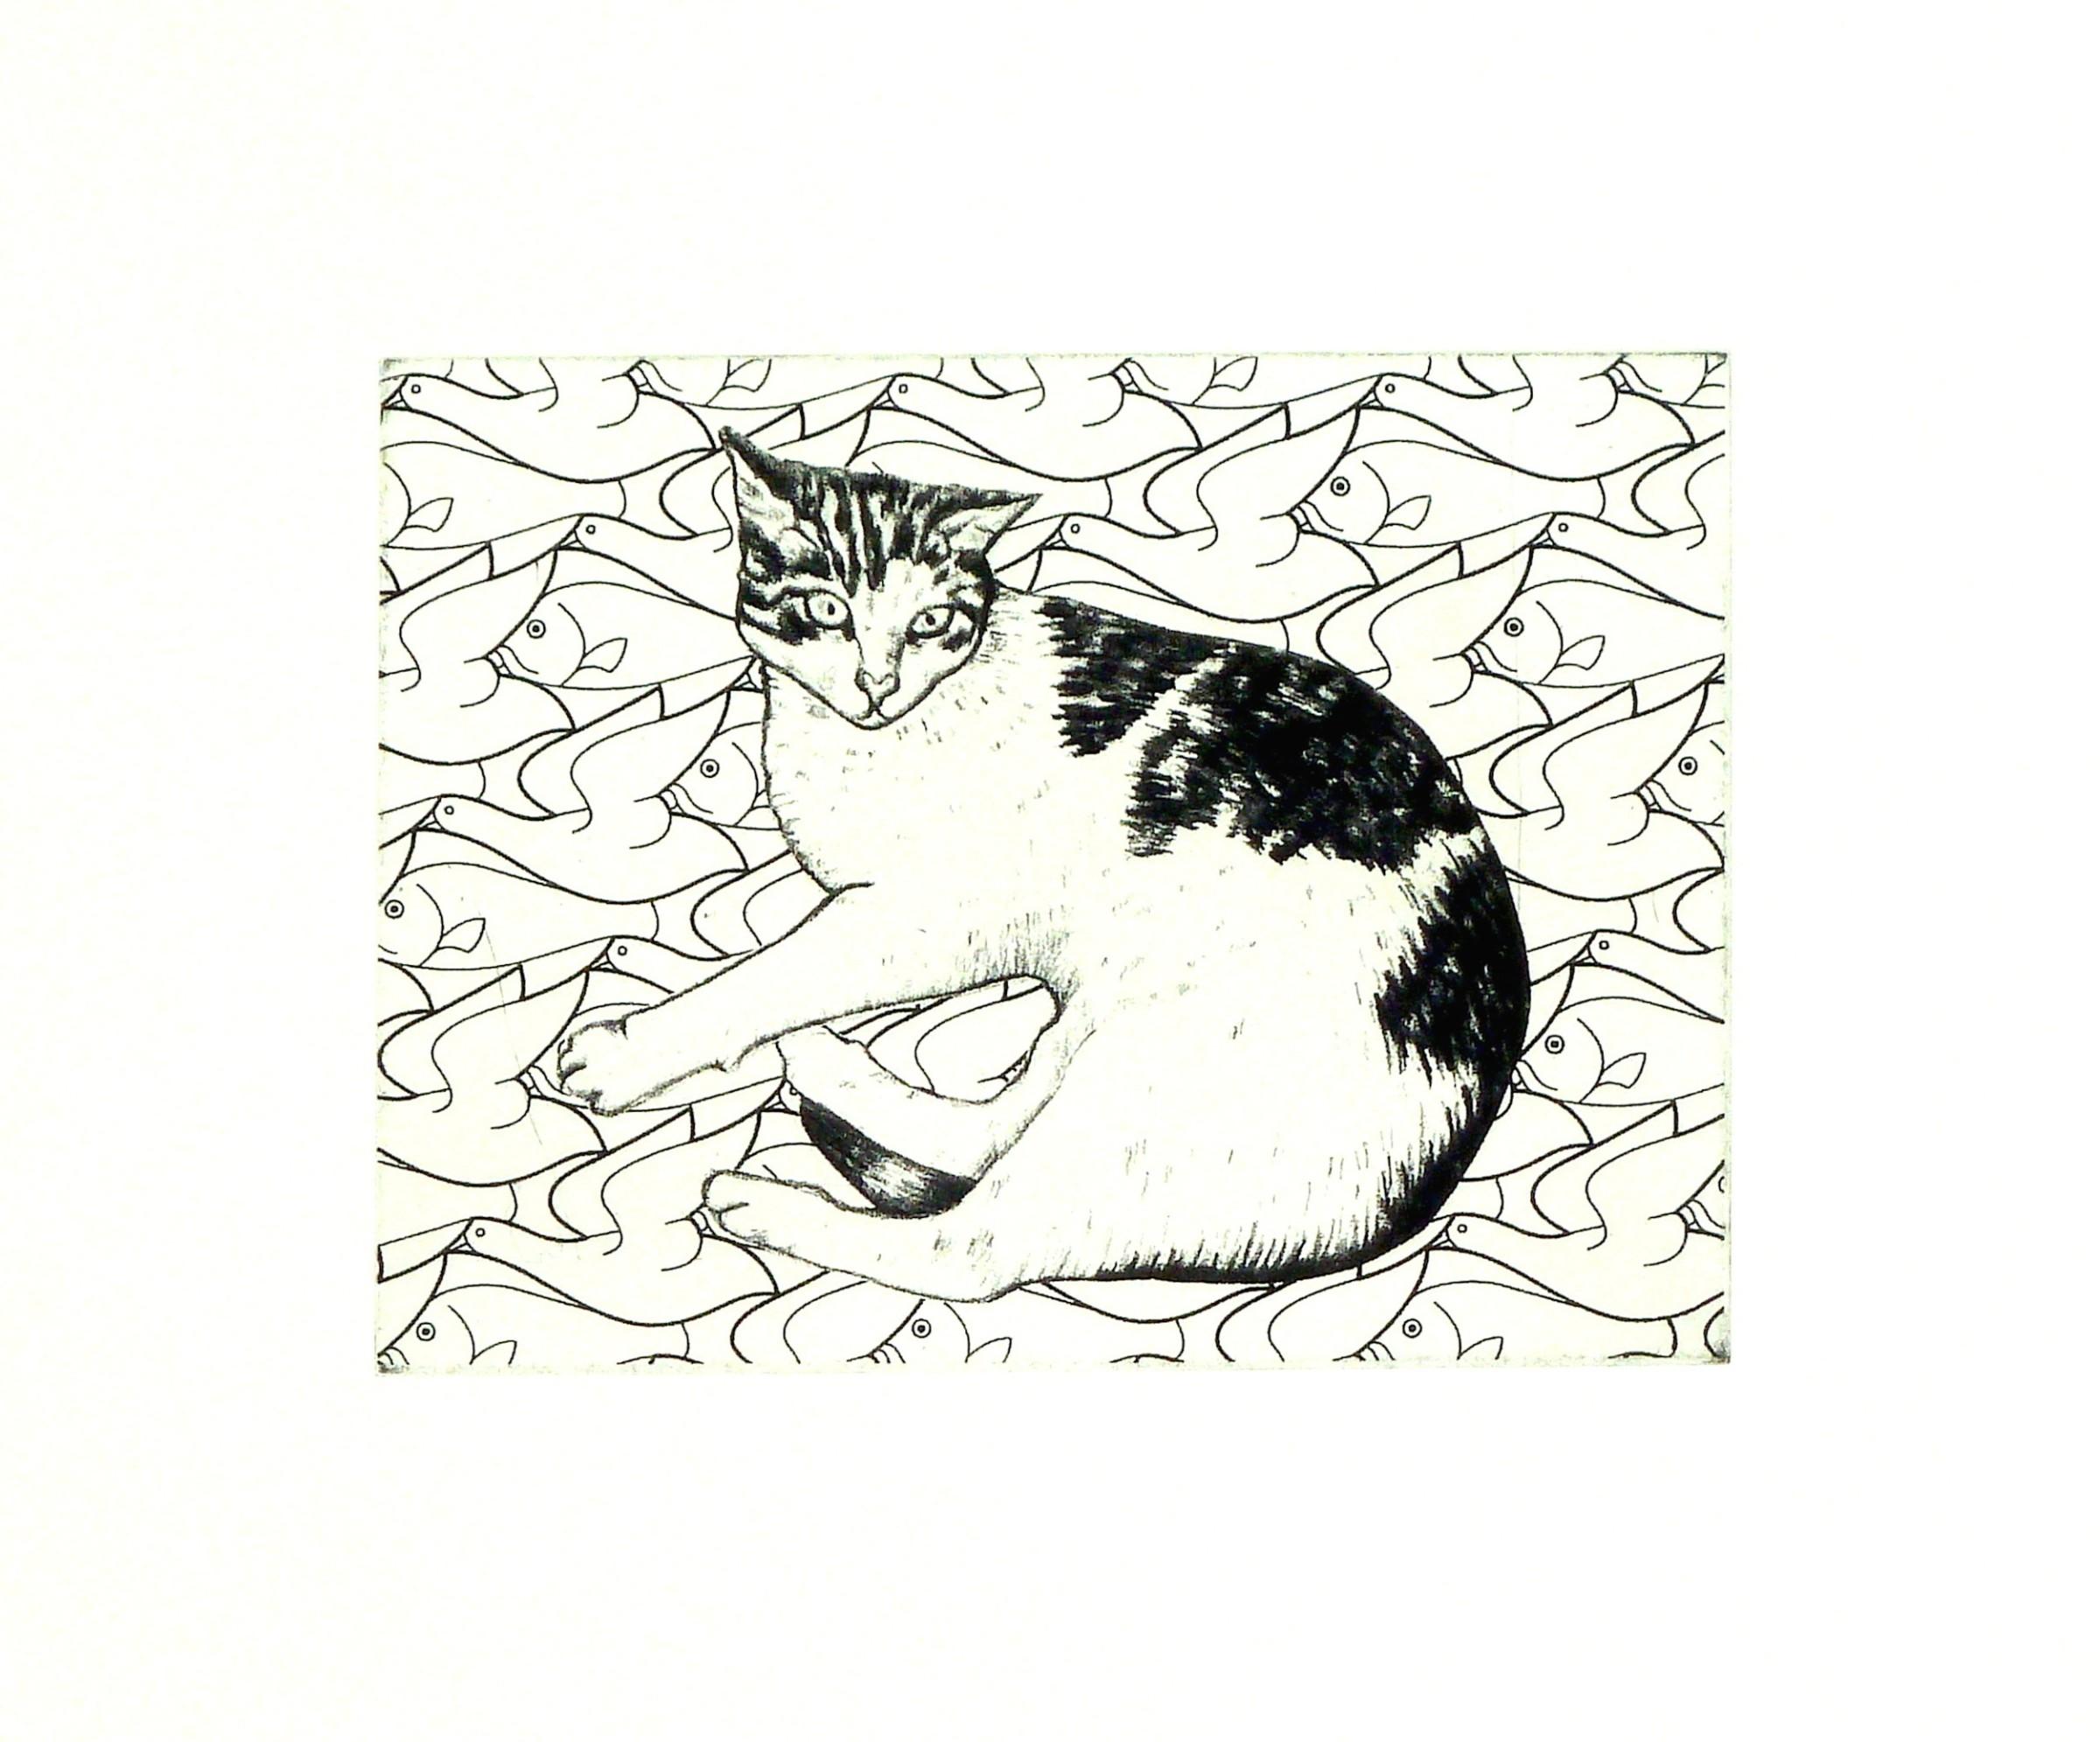 "<span class=""link fancybox-details-link""><a href=""/exhibitions/23/works/artworks_standalone11340/"">View Detail Page</a></span><div class=""artist""><span class=""artist""><strong>Meg Dutton RE</strong></span></div><div class=""title""><em>Dreaming Cat</em></div><div class=""medium"">etching</div><div class=""dimensions"">28 x 39 cm paper size<br>12.5 x 17 cm image size</div><div class=""edition_details"">edition of 100</div>"